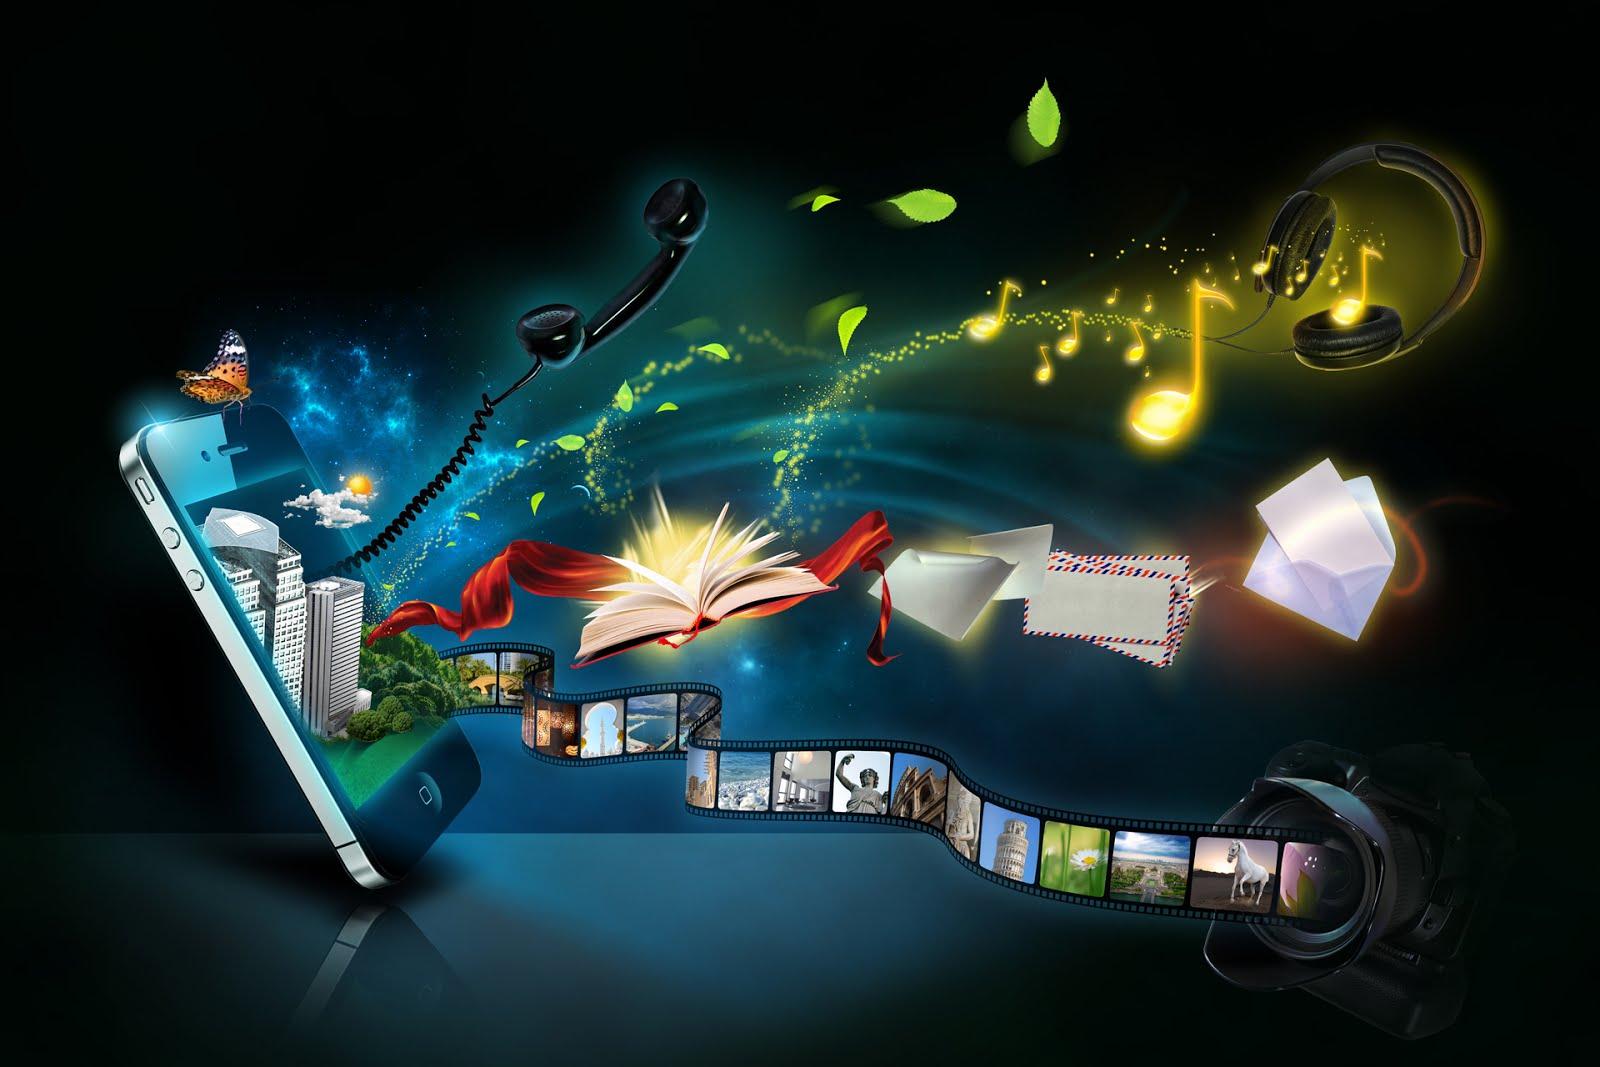 http://3.bp.blogspot.com/-uvCJLx0fuh0/UQ6g3oIstCI/AAAAAAABmWk/utuUjFOZEJ4/s1600/tecnolog%25C3%25ADas-de-la-informaci%25C3%25B3n-en-los-smartphones-o-tel%25C3%25A9fonos-celulares-multimedia-.jpg